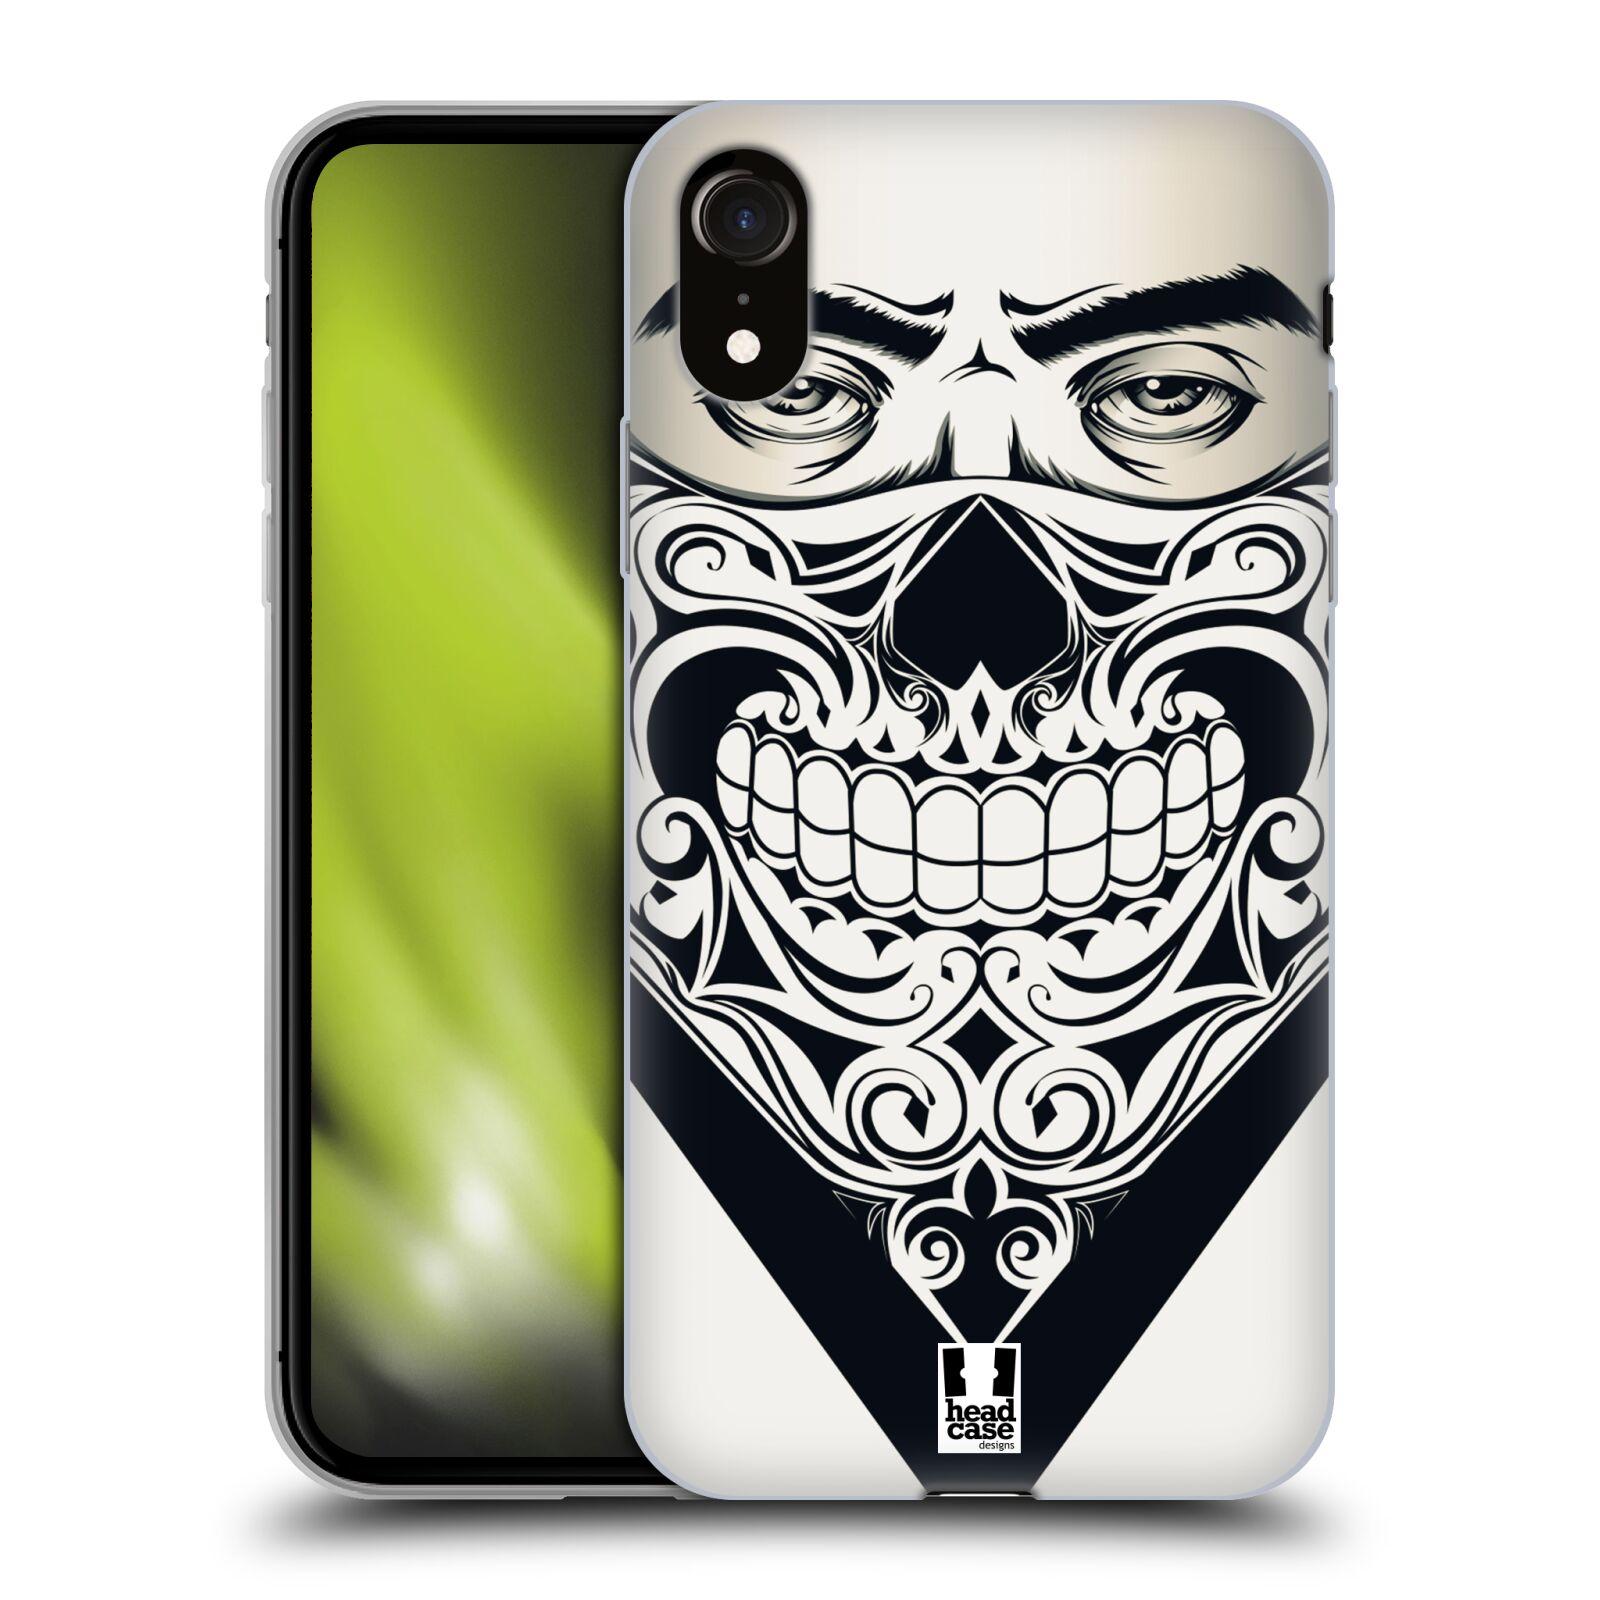 Silikonové pouzdro na mobil Apple iPhone XR - Head Case - LEBKA BANDANA